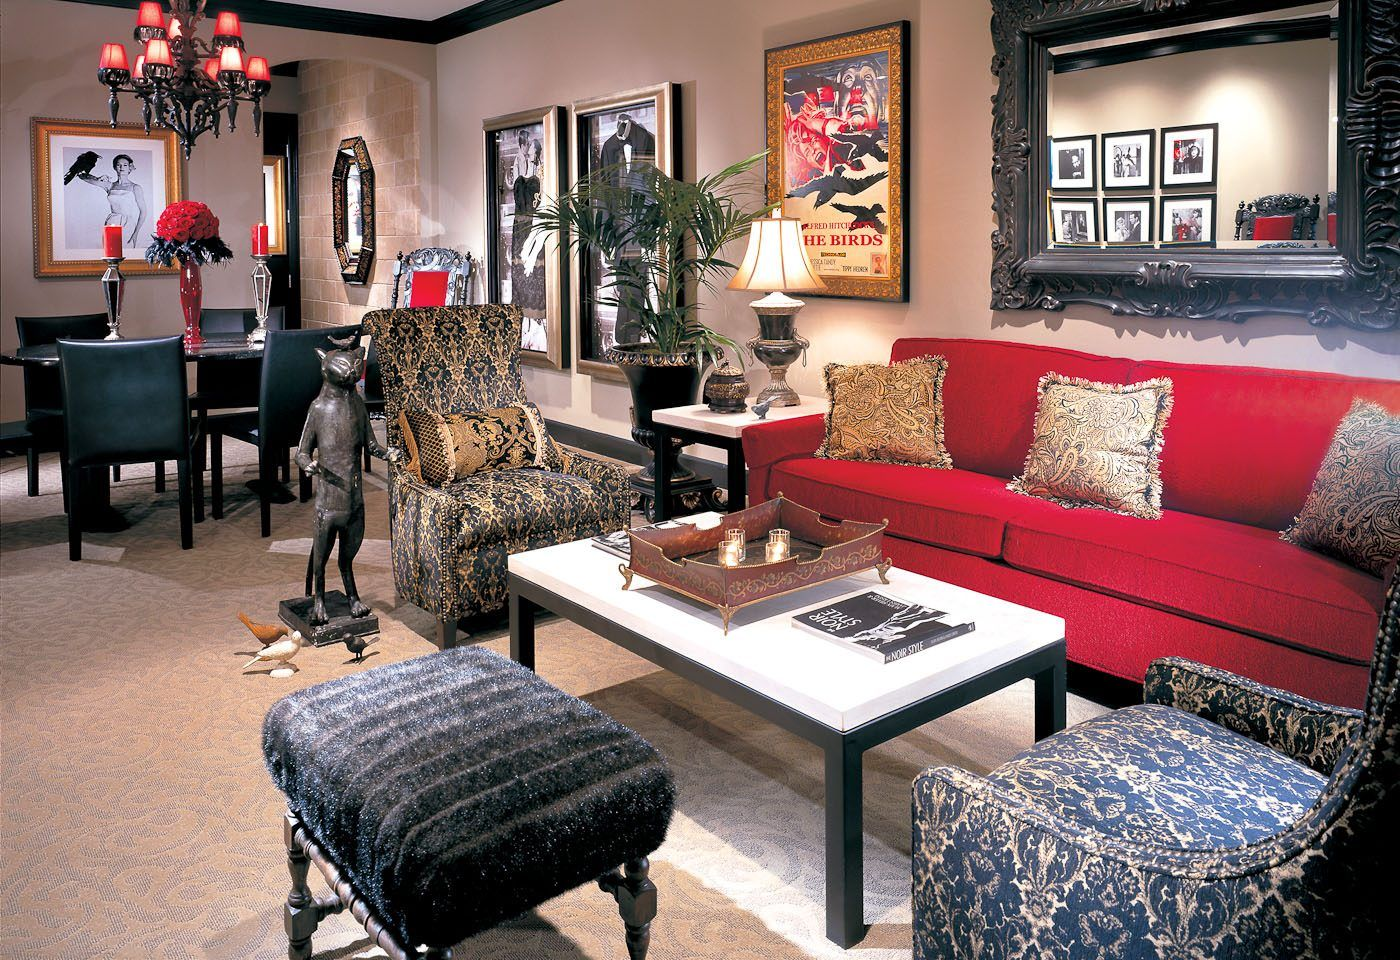 Texas Boutique Hotels Interior design usa, Home decor, Decor